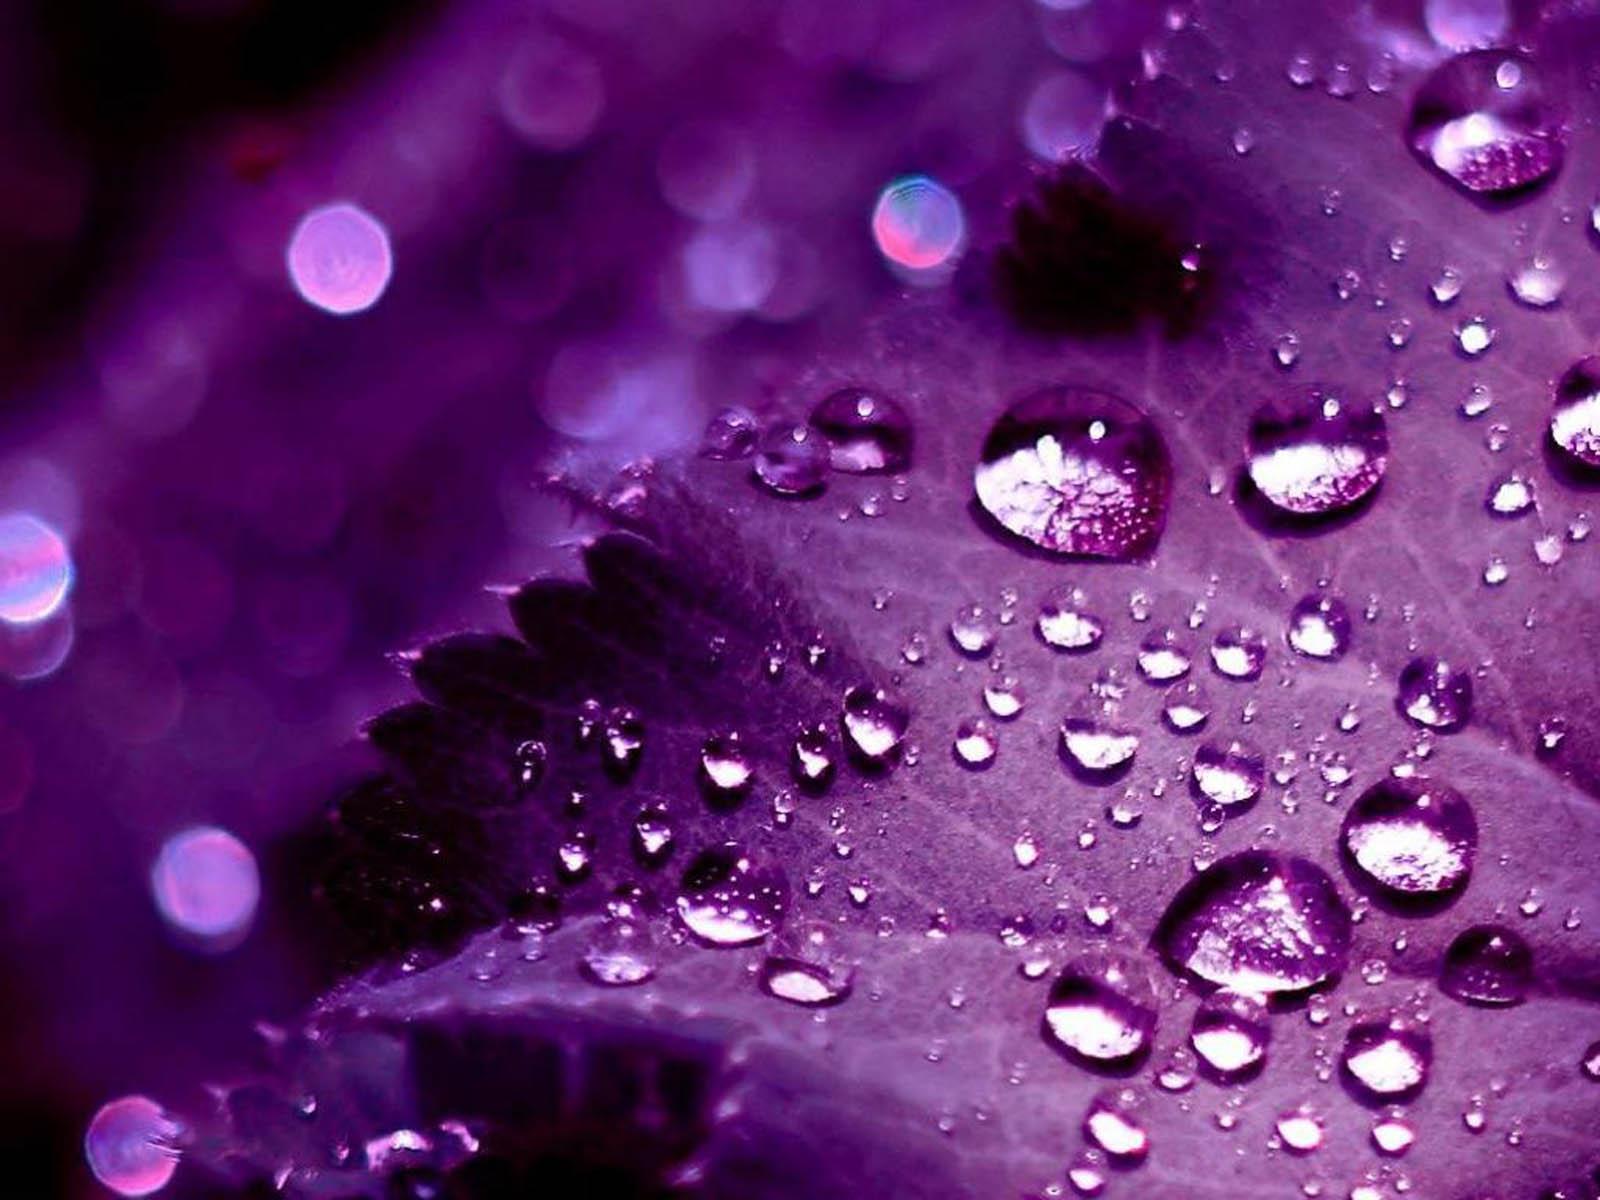 Cool Purple Backgrounds wallpaper wallpaper hd background desktop 1600x1200